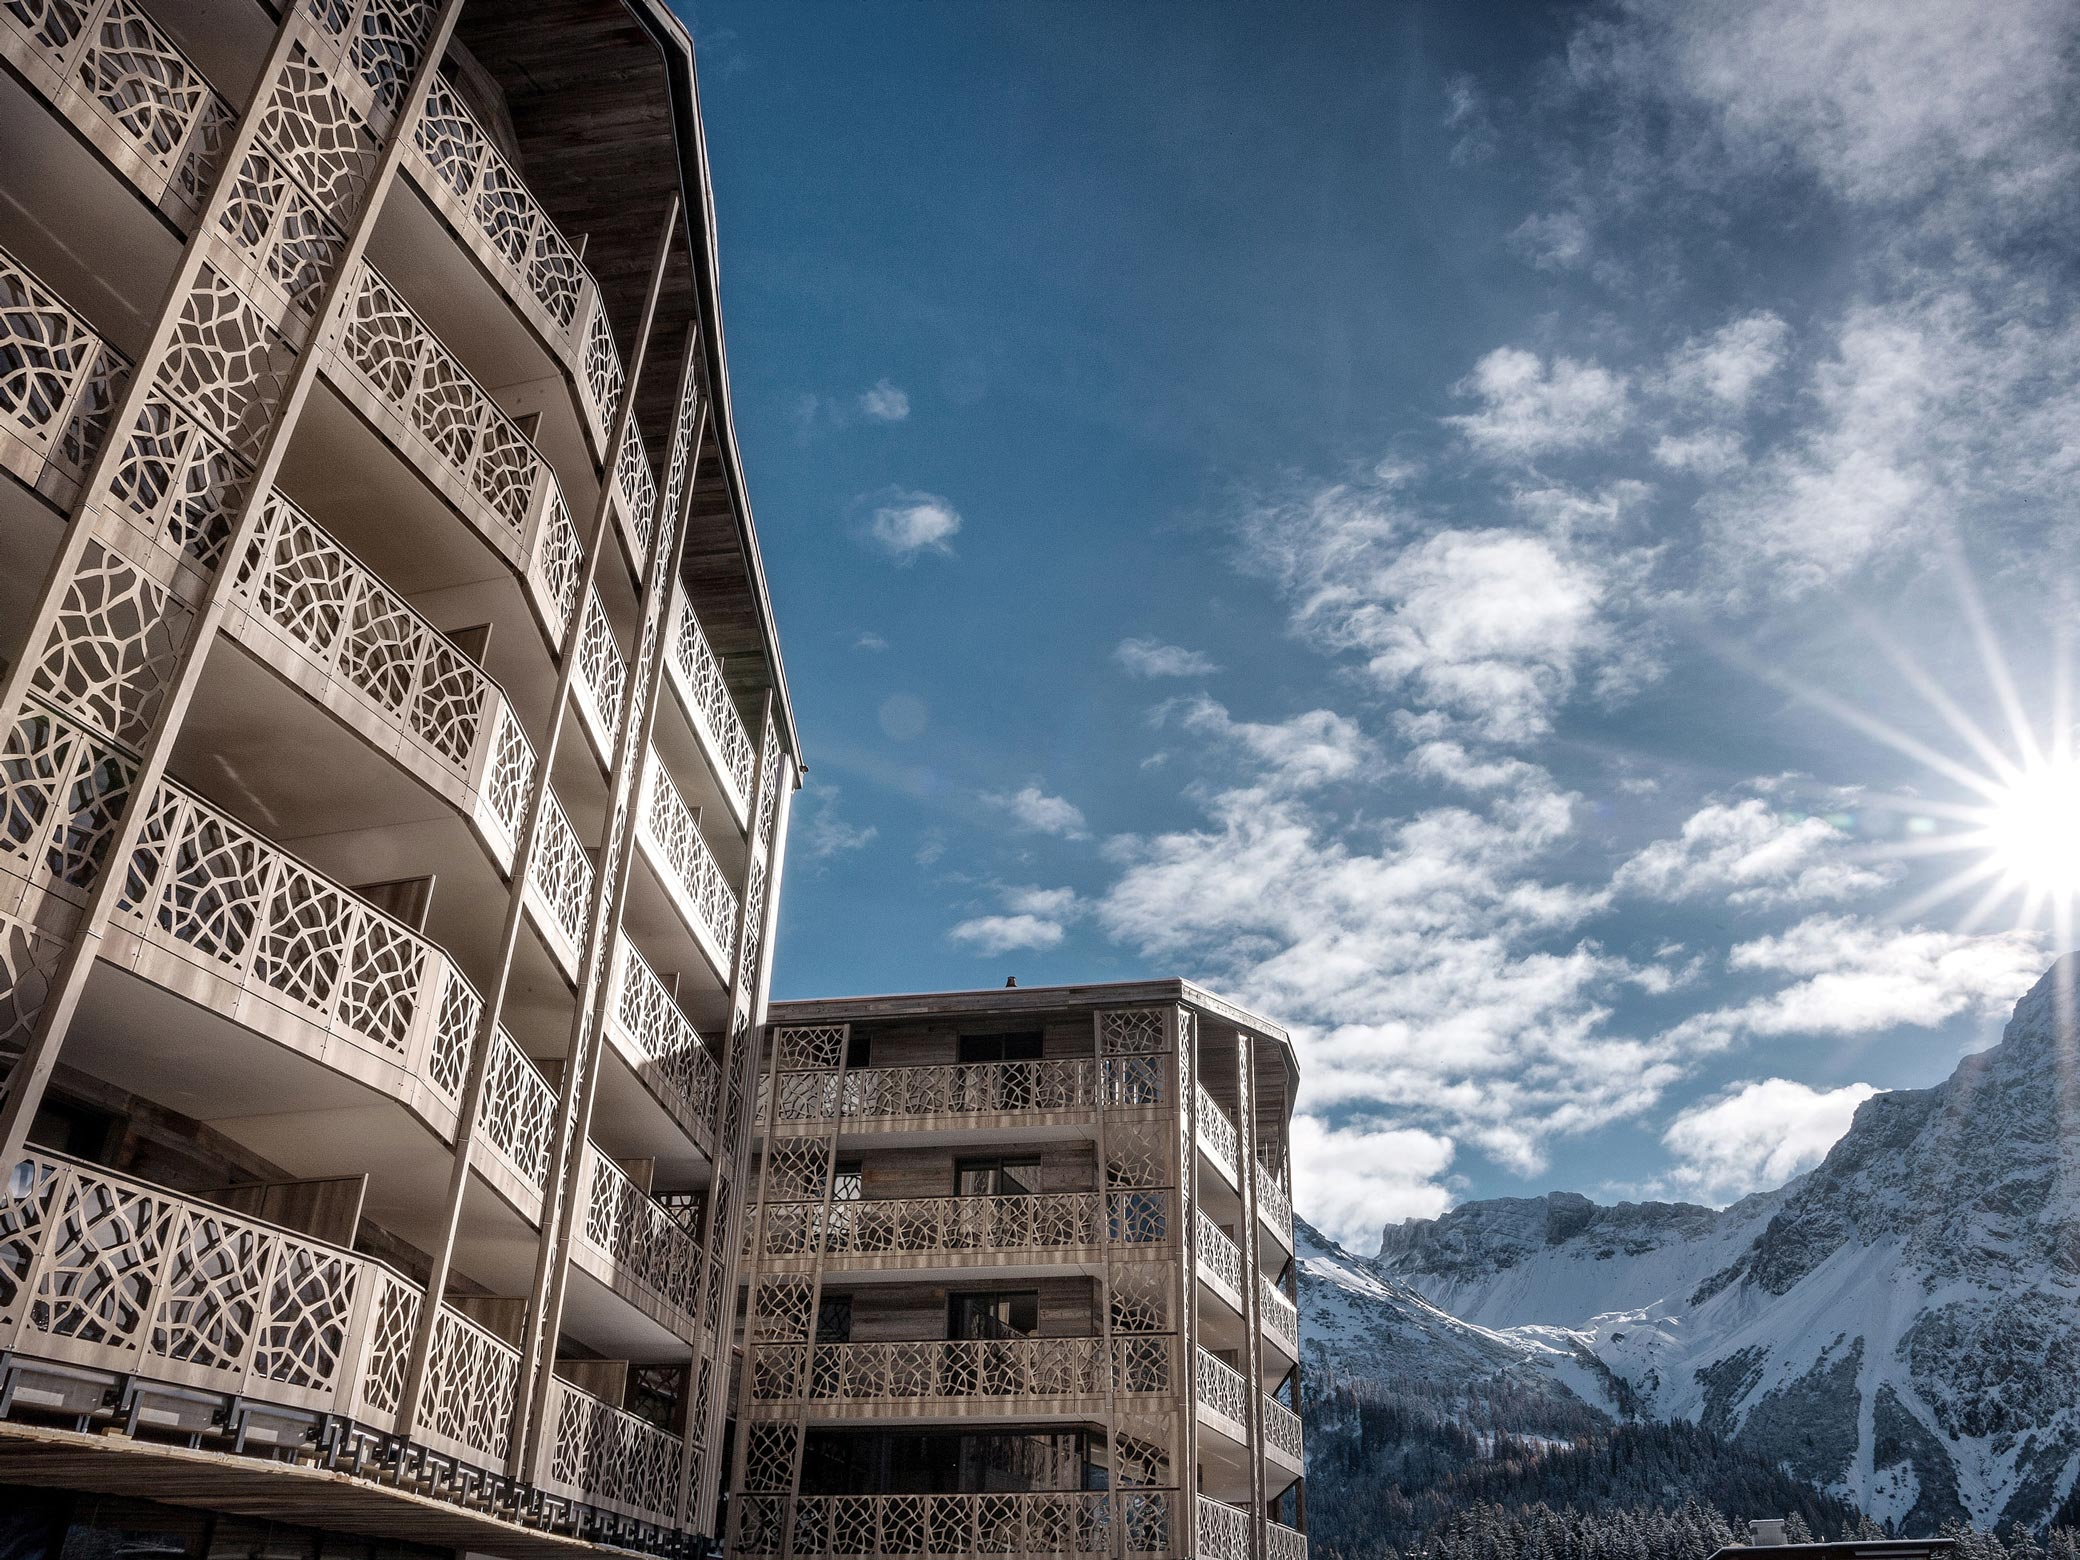 Valsana Hotel Arosa Aussenansicht Winter KURTS